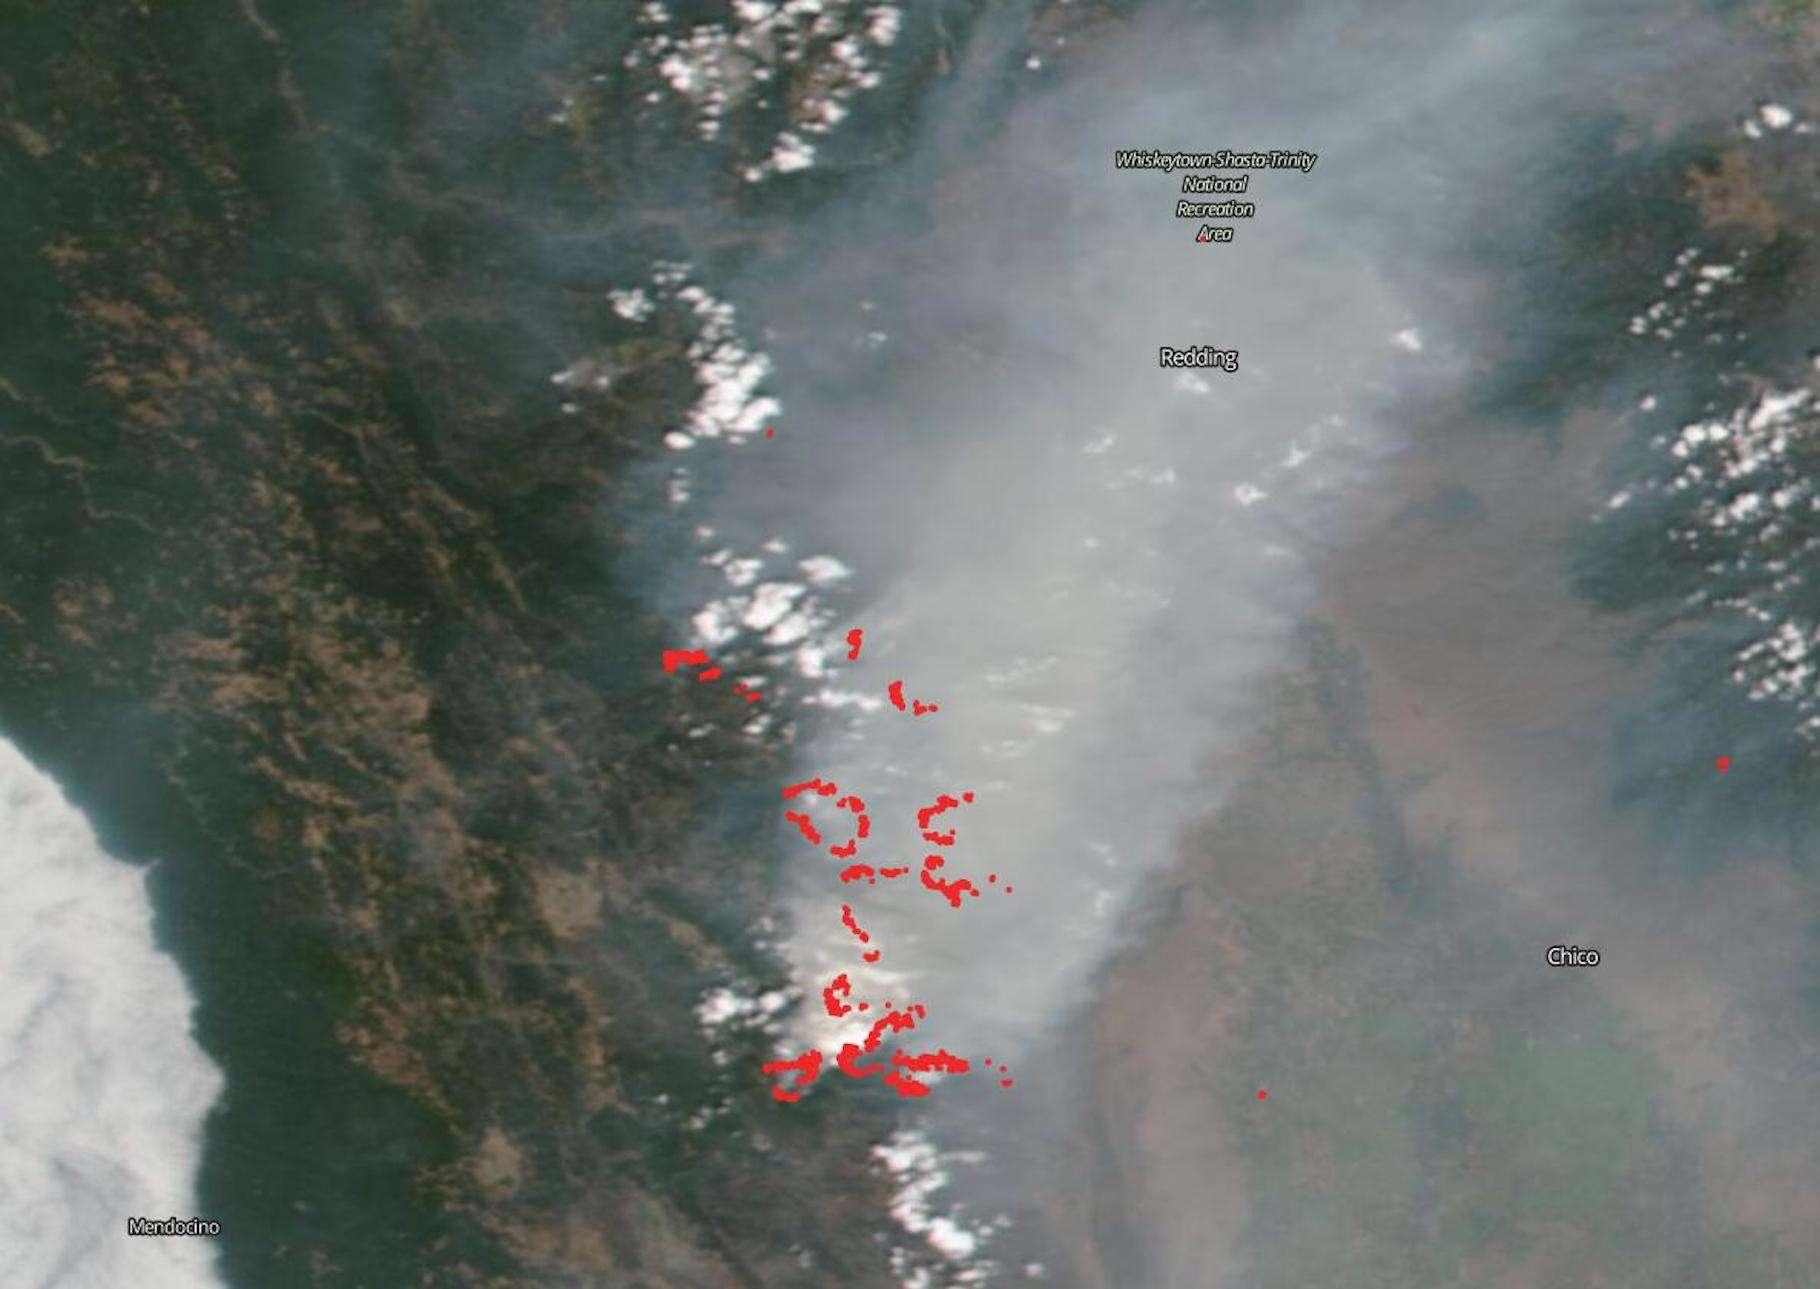 Le giga-incendie du complexe d'août, en Californie, vu par le satellite Suomi NPP (NOAA, Nasa). © NASA Worldview, Earth Observing System Data and Information System (EOSDIS)